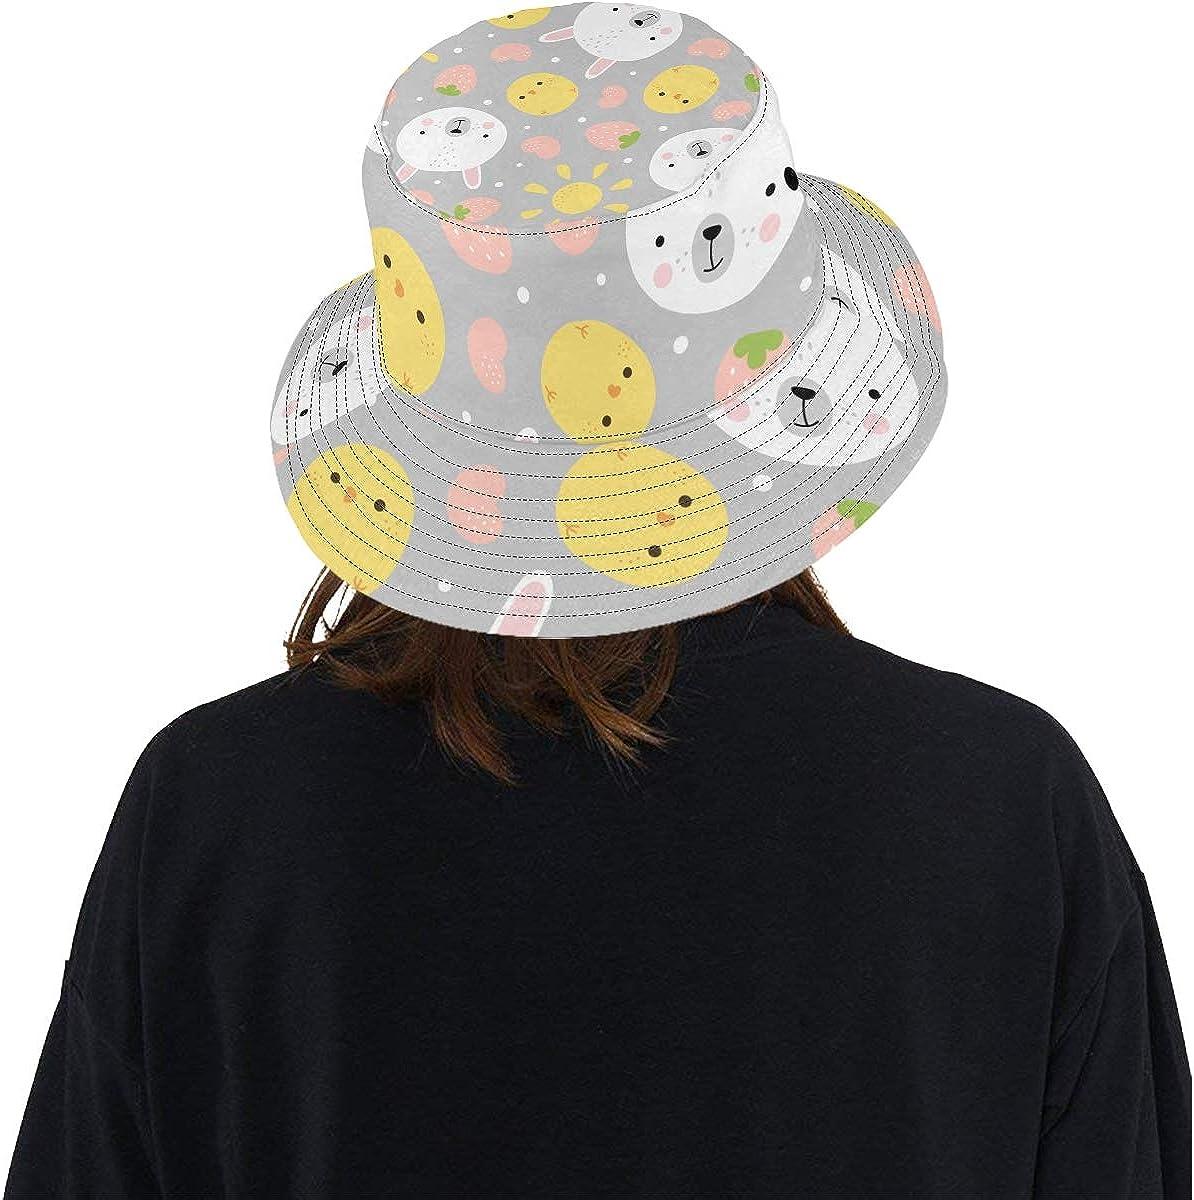 Hat Bucket Summer Unisex Bucket Hat Chicks Bunny Rabbit Animal Reversible Fisherman Cap Travel Rain Picnic Hat for Lady Boy